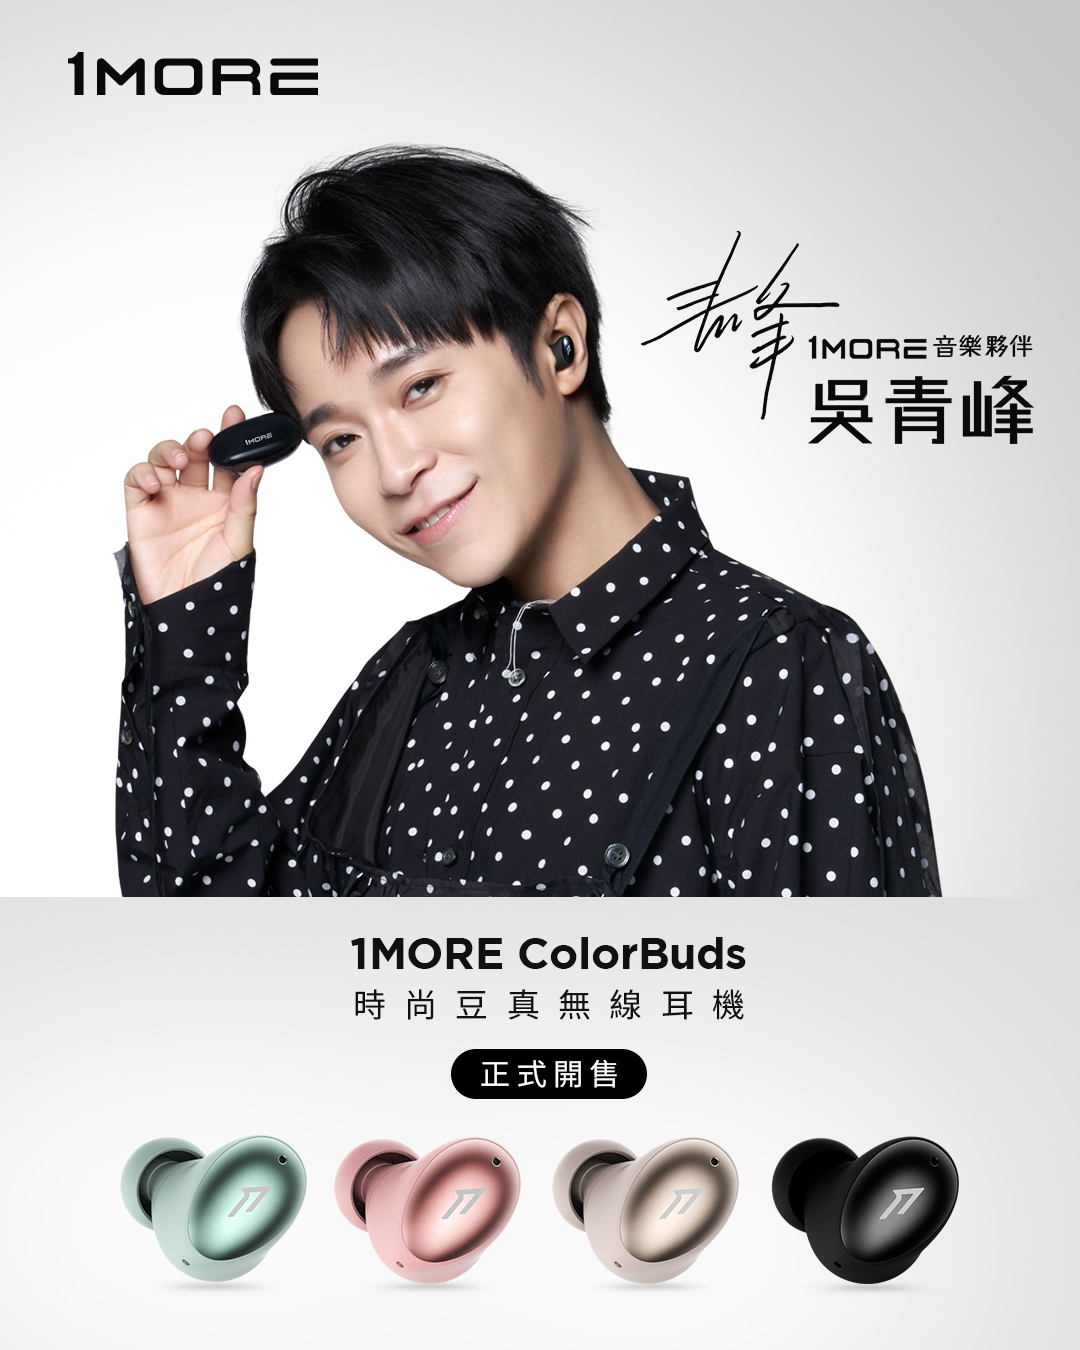 1 MORE萬魔聲學重磅推出1MORE ColorBuds時尚豆真無線耳機,由音樂夥伴的吳青峰代言推薦!